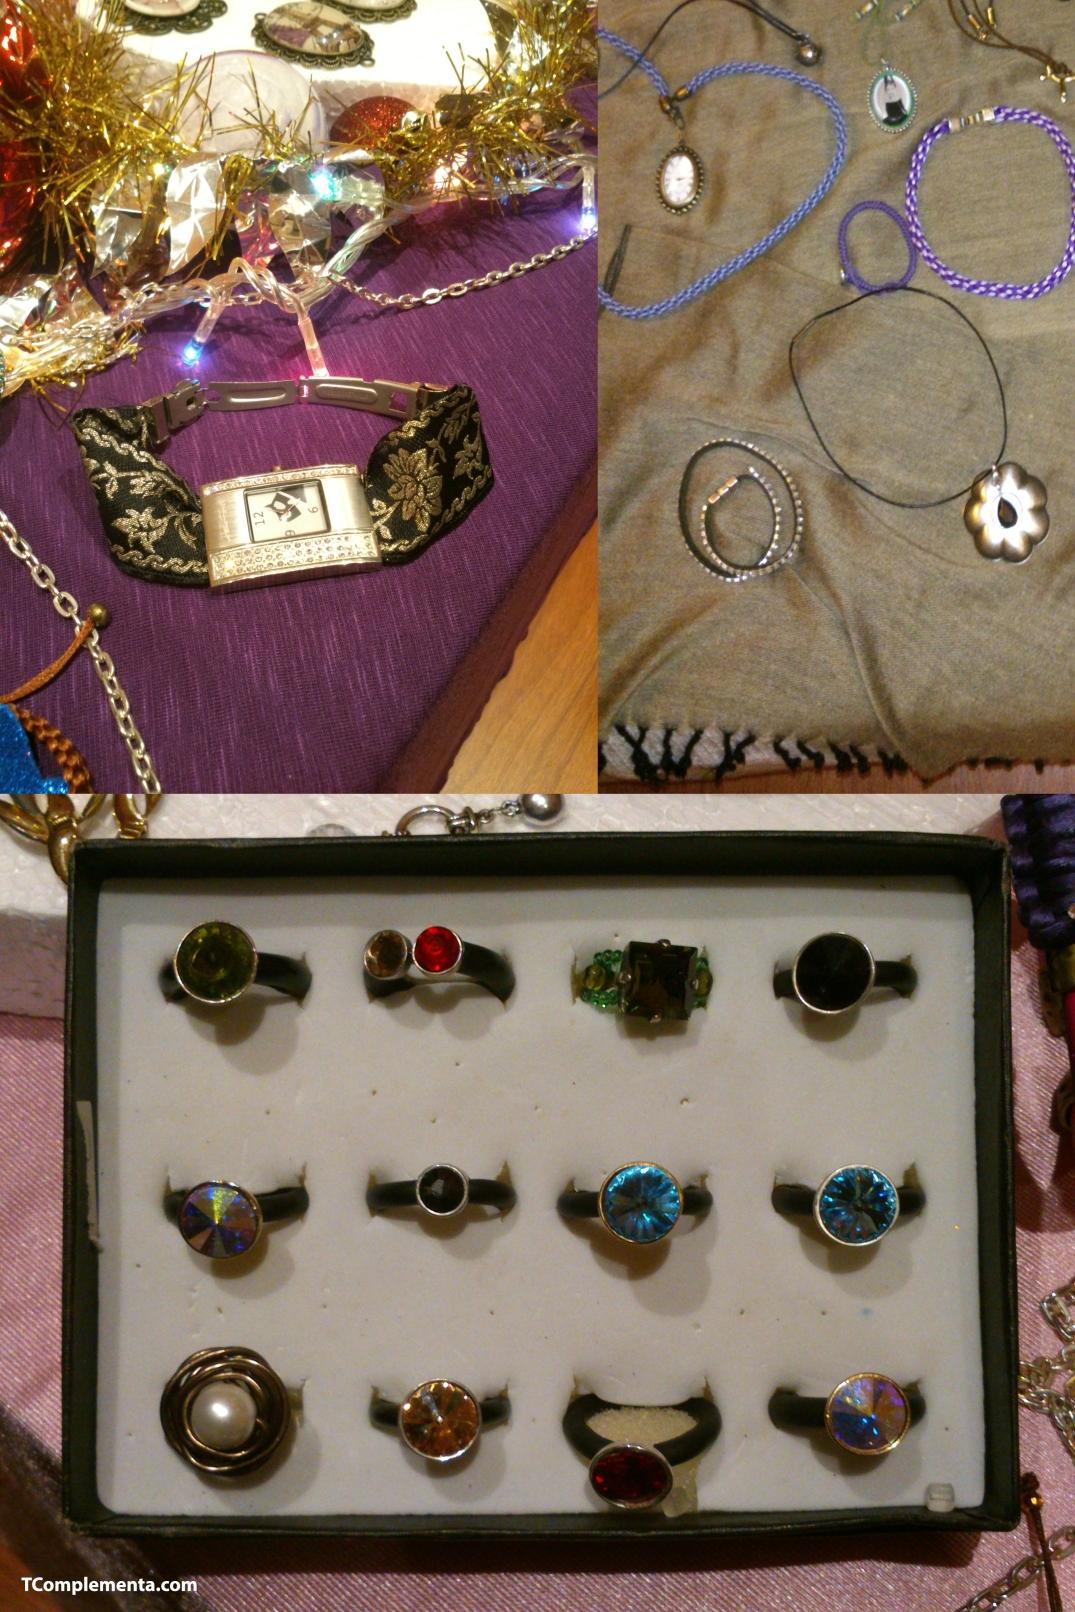 Diseños de Petruska Alri: relojes, pulseras, medallones, etc. - Fotografía de Ismael Pérez Arana.